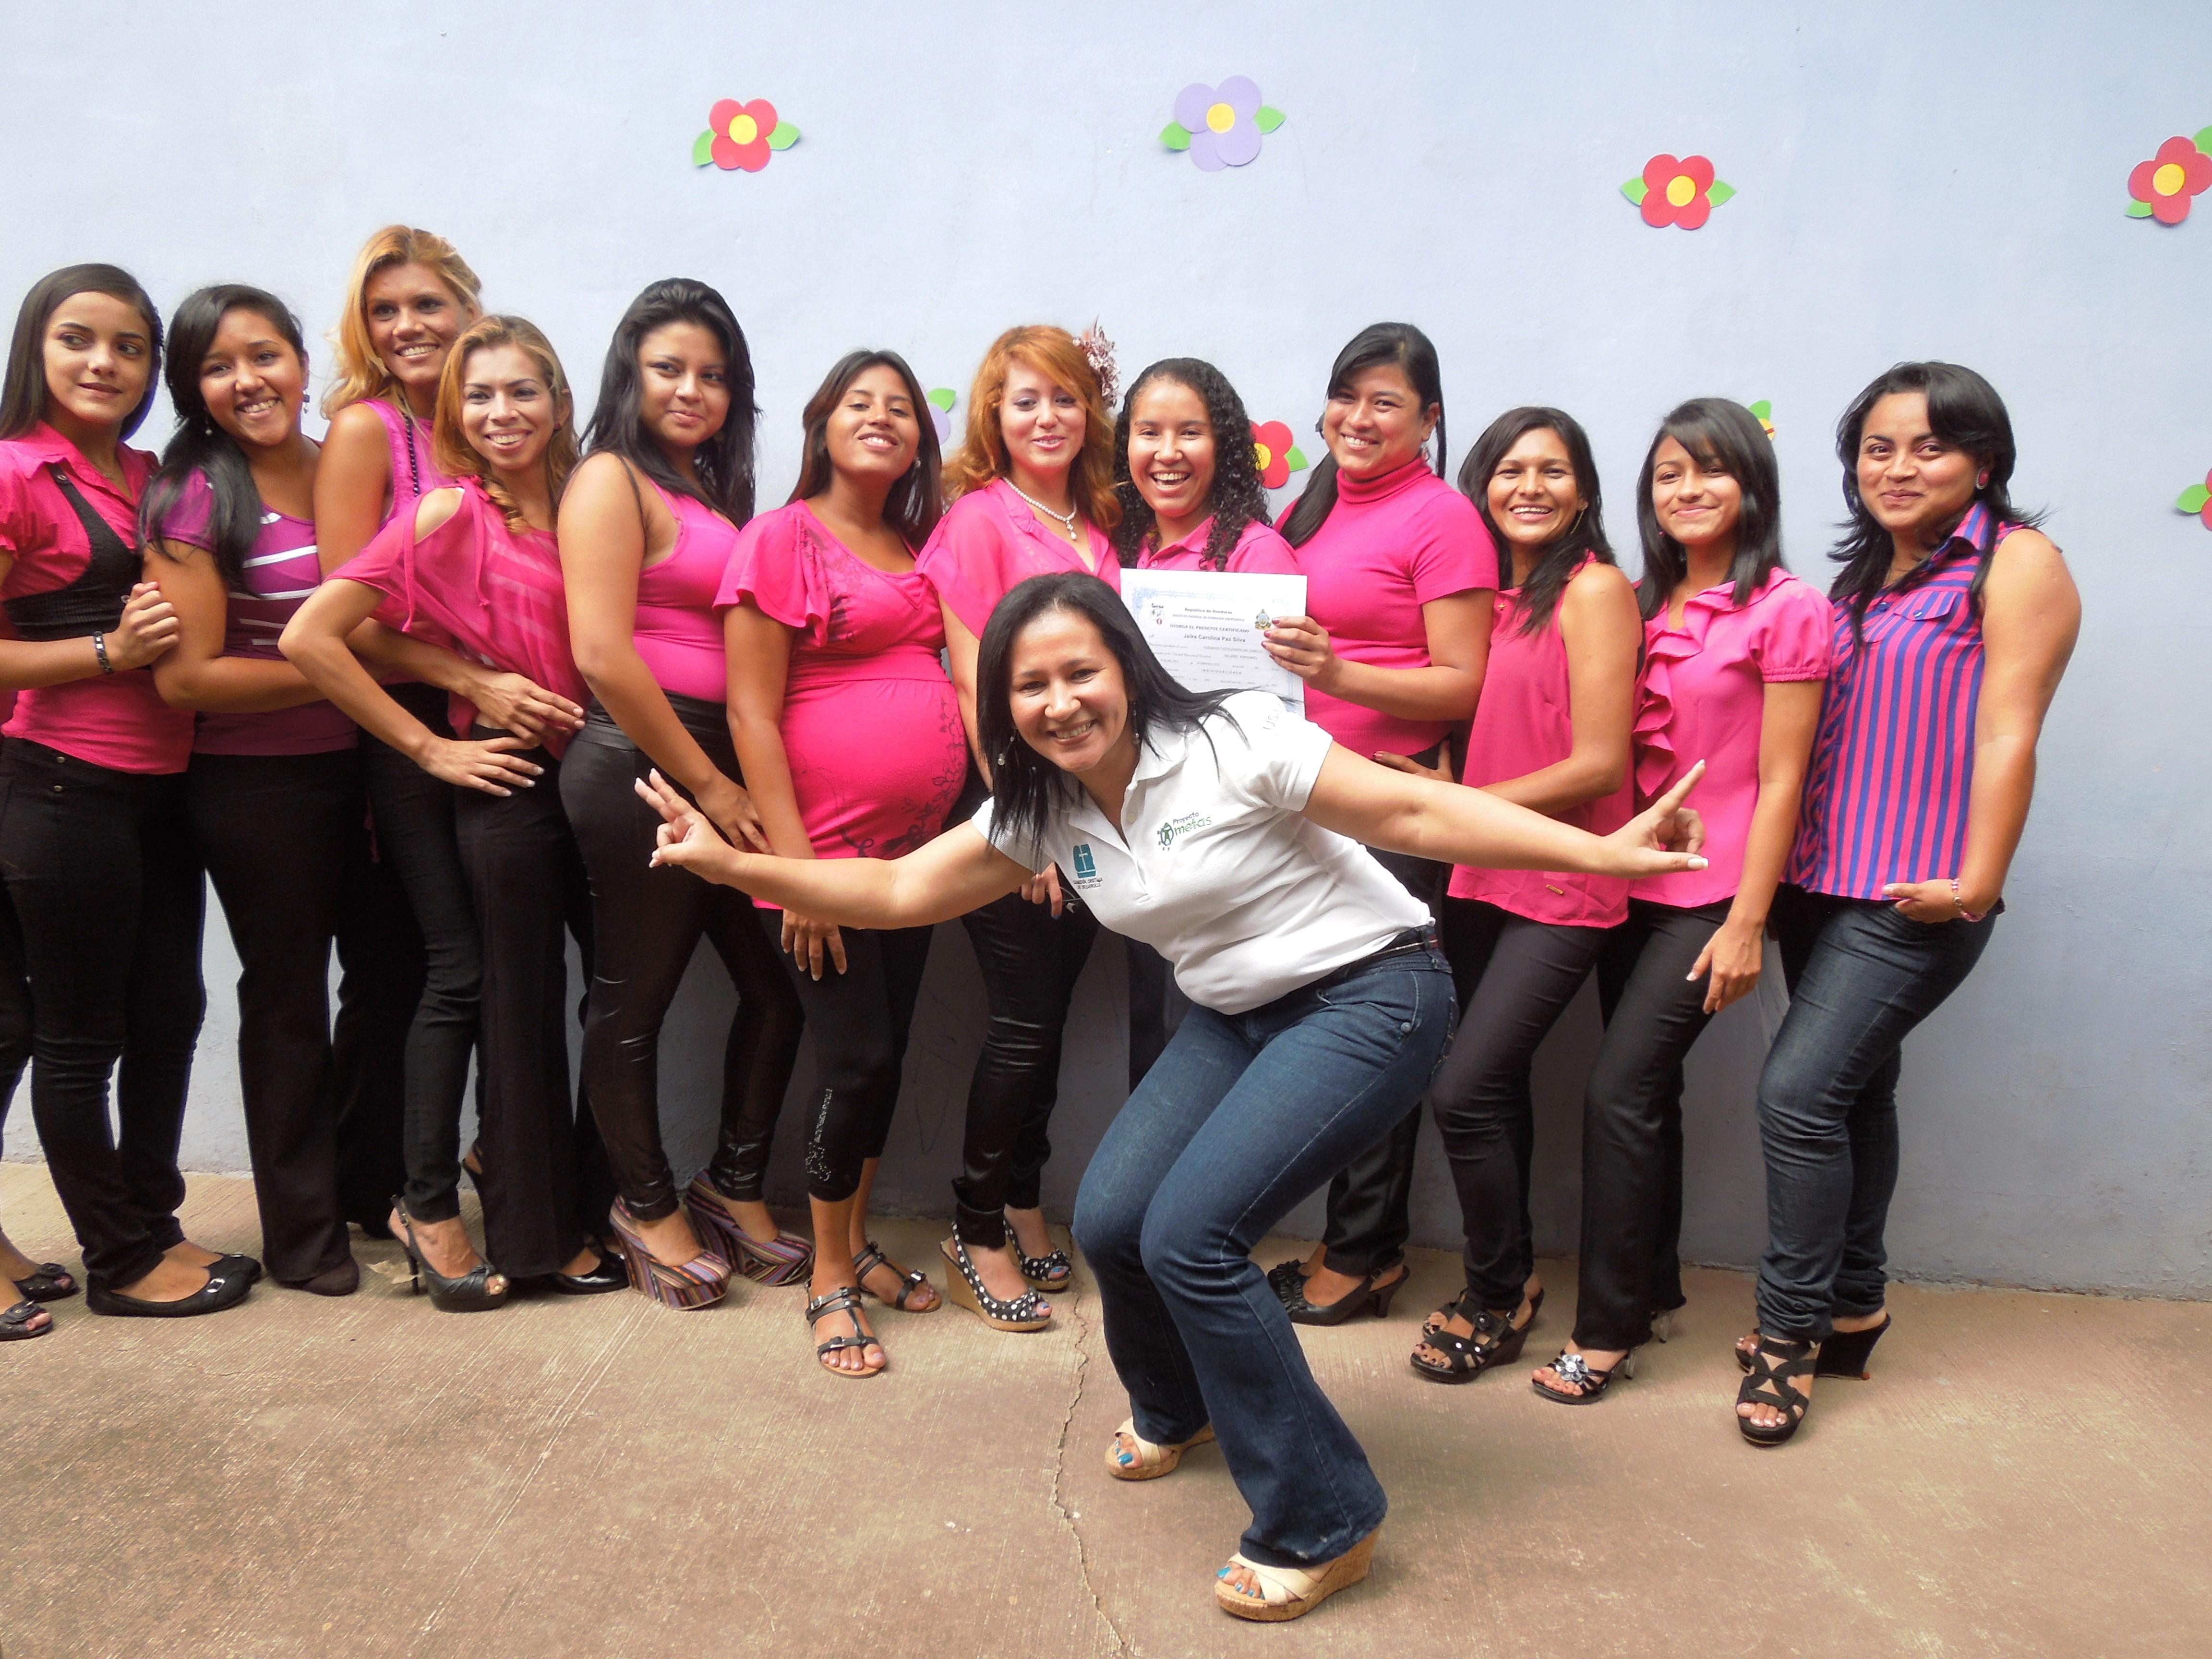 Honduras_2017_Maryjane_Westra_3.jpeg